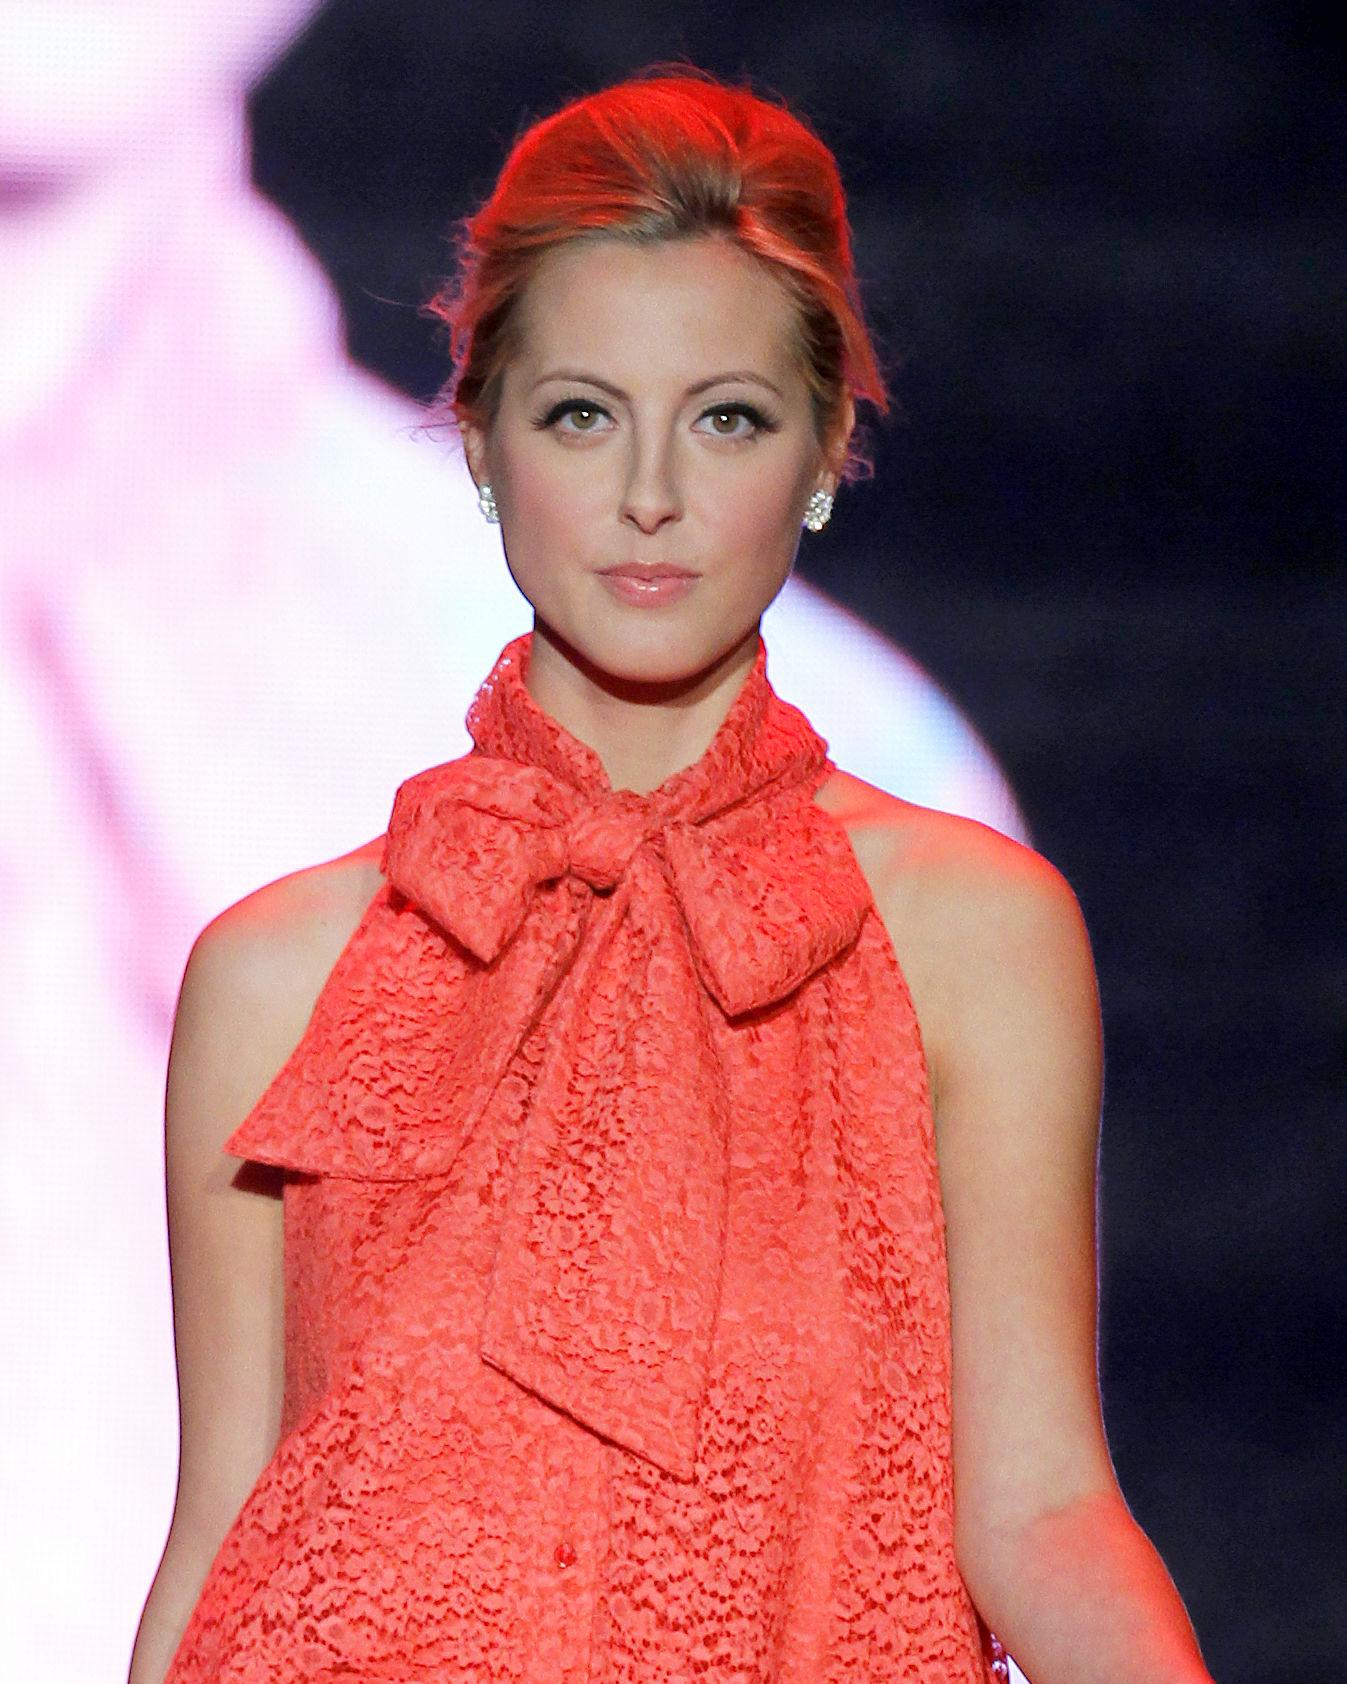 Photo of Eva Amurri: An American actress